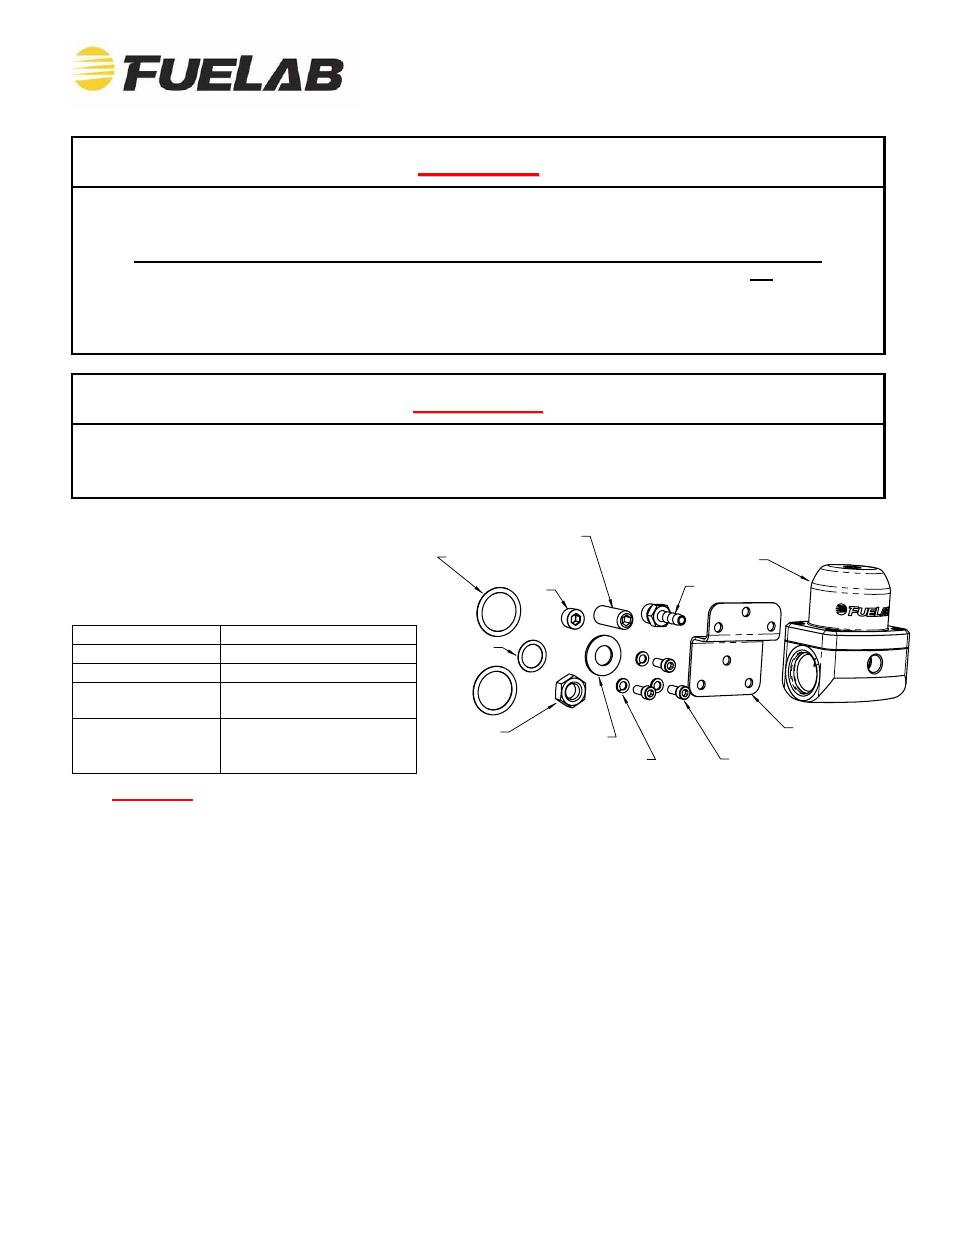 Lovehorsepower mr2 turbo regulator kit installation.